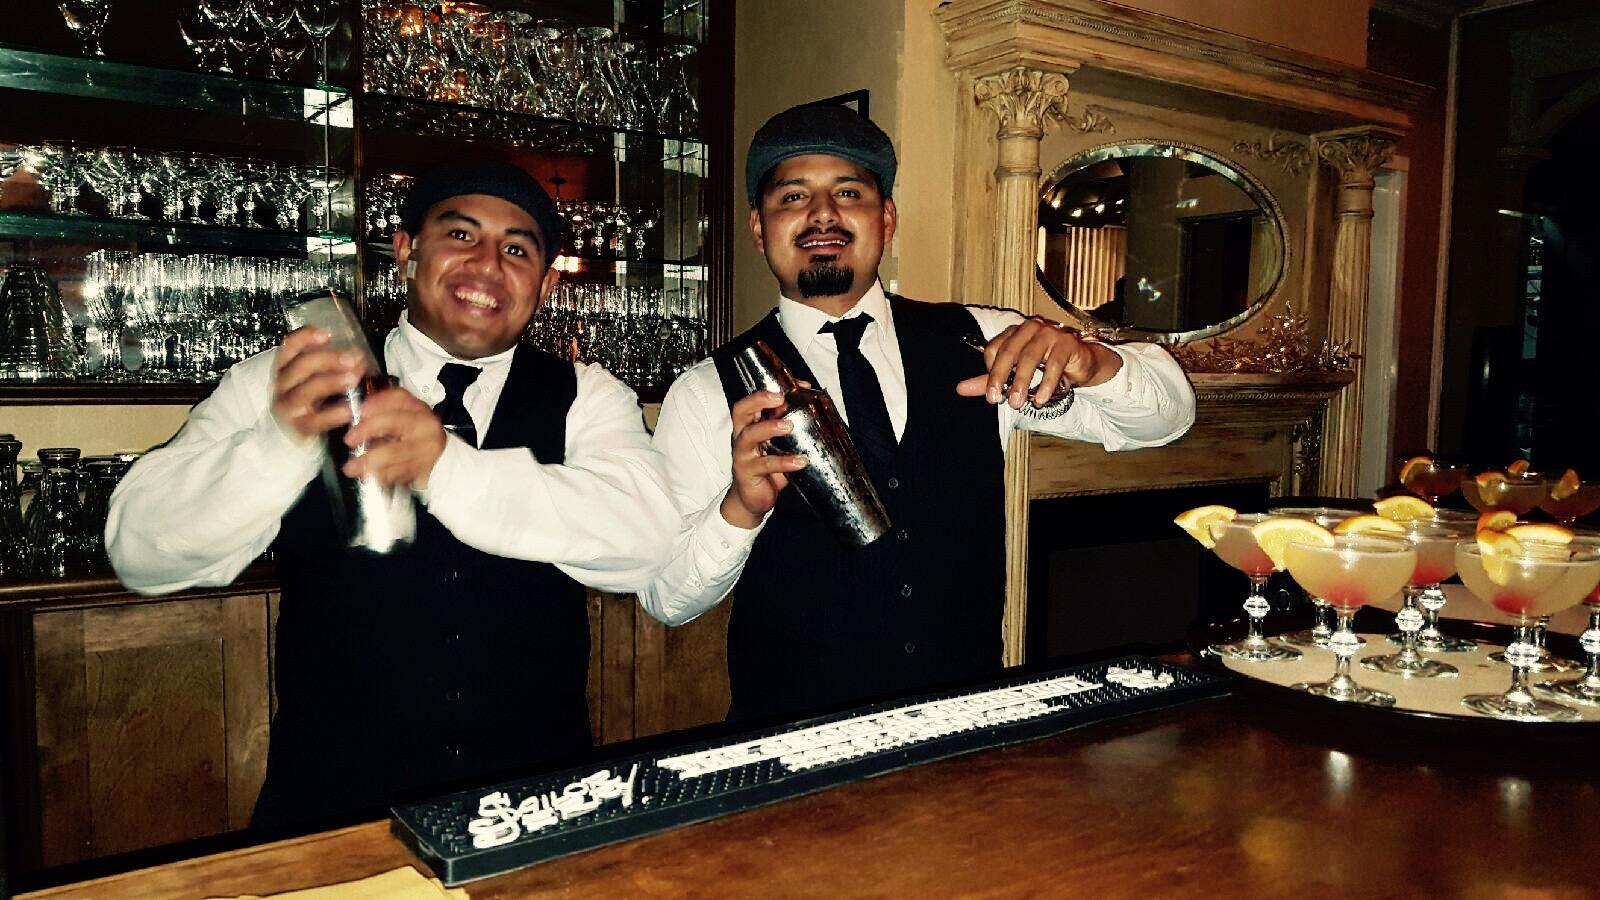 Perry House Bartenders at Speakeasy Bootleggers Ball